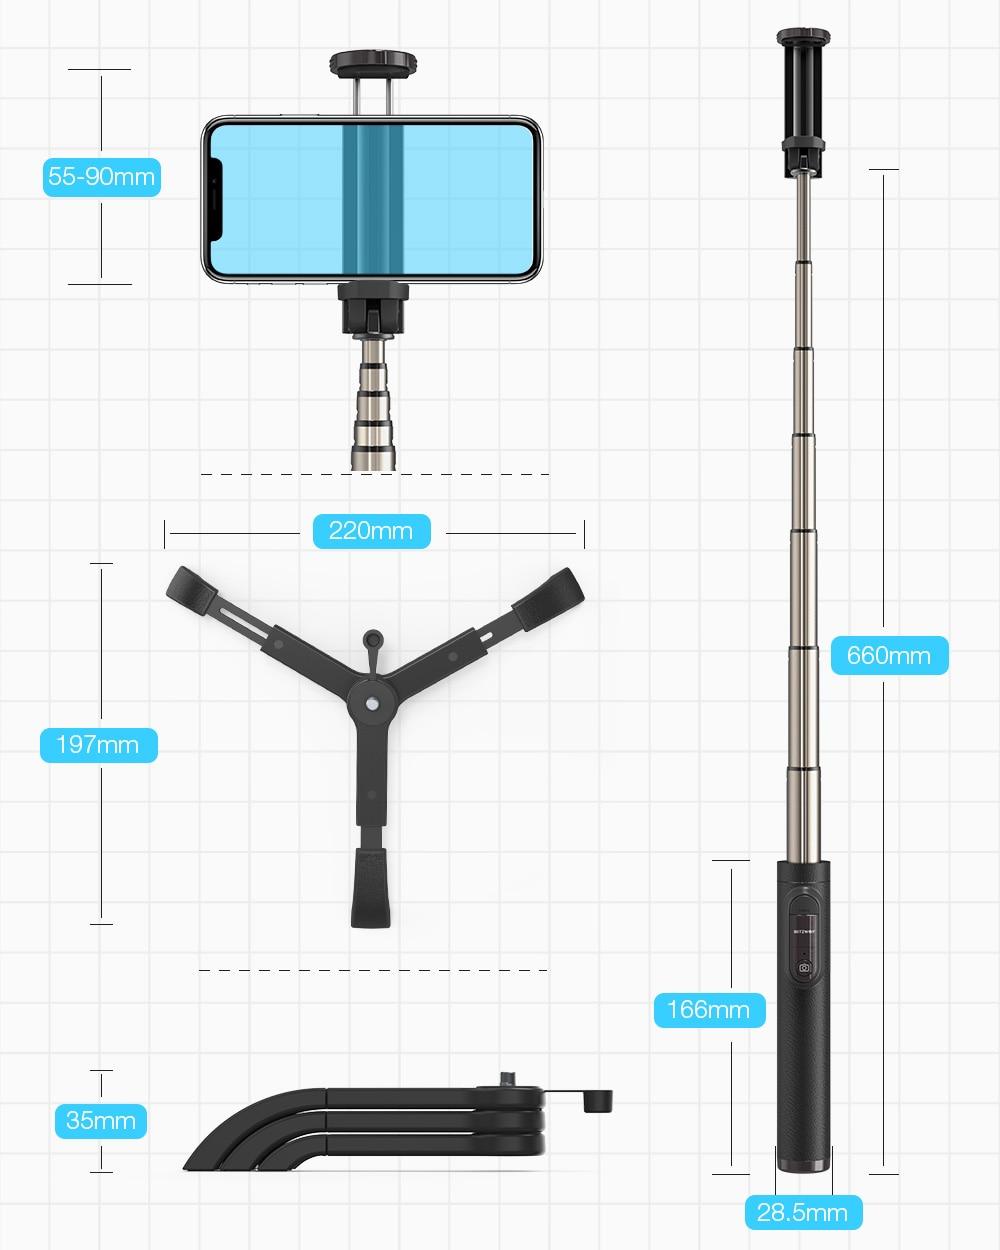 Blitzwolf bw-bs9 all in one mini bluetooth selfie stick monopod tripod integrated detachable tripods selfie sticks for iphone (black)